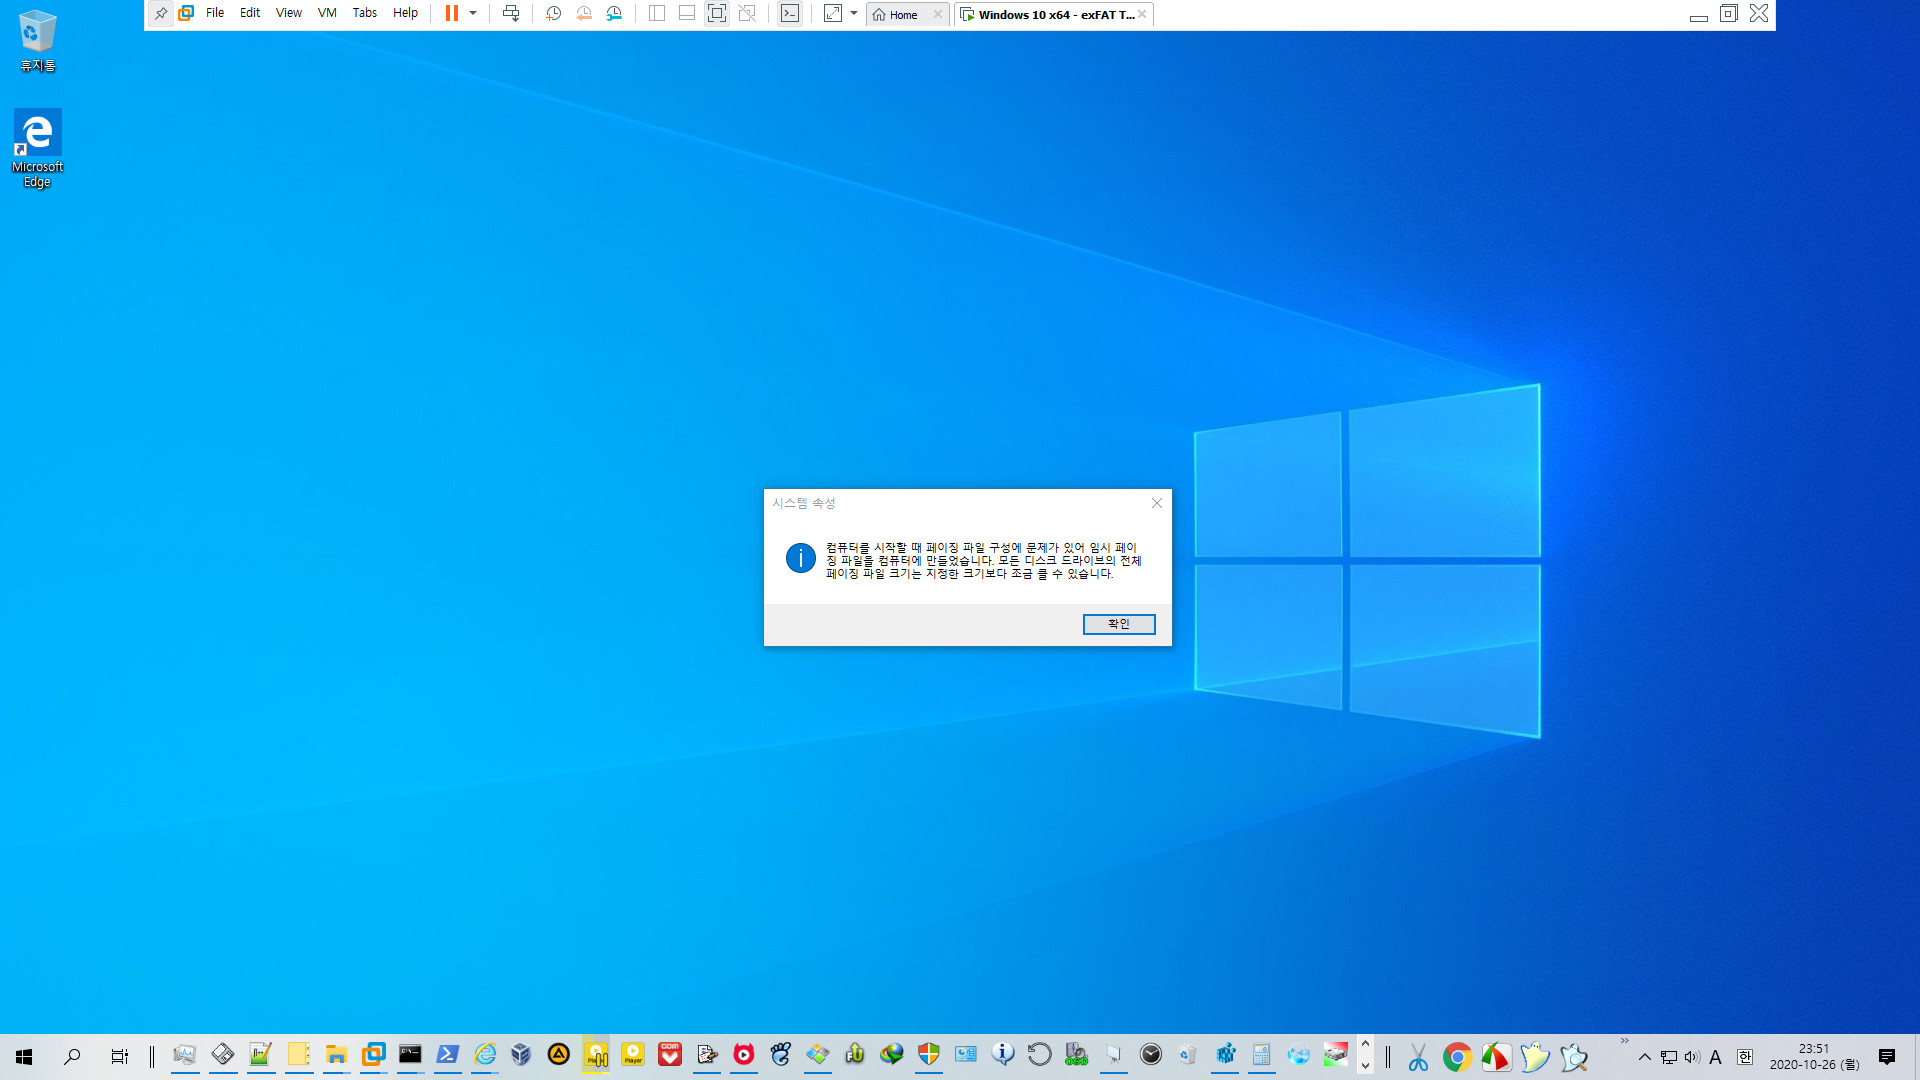 exFAT 포맷으로도 VHD 부팅이 Windows 10 버전 1903부터 된다고 하여 테스트 - 생고생만 하다가 컴퓨터 먹통 2번이나 되고 그만뒀습니다 2020-10-26_235140.jpg